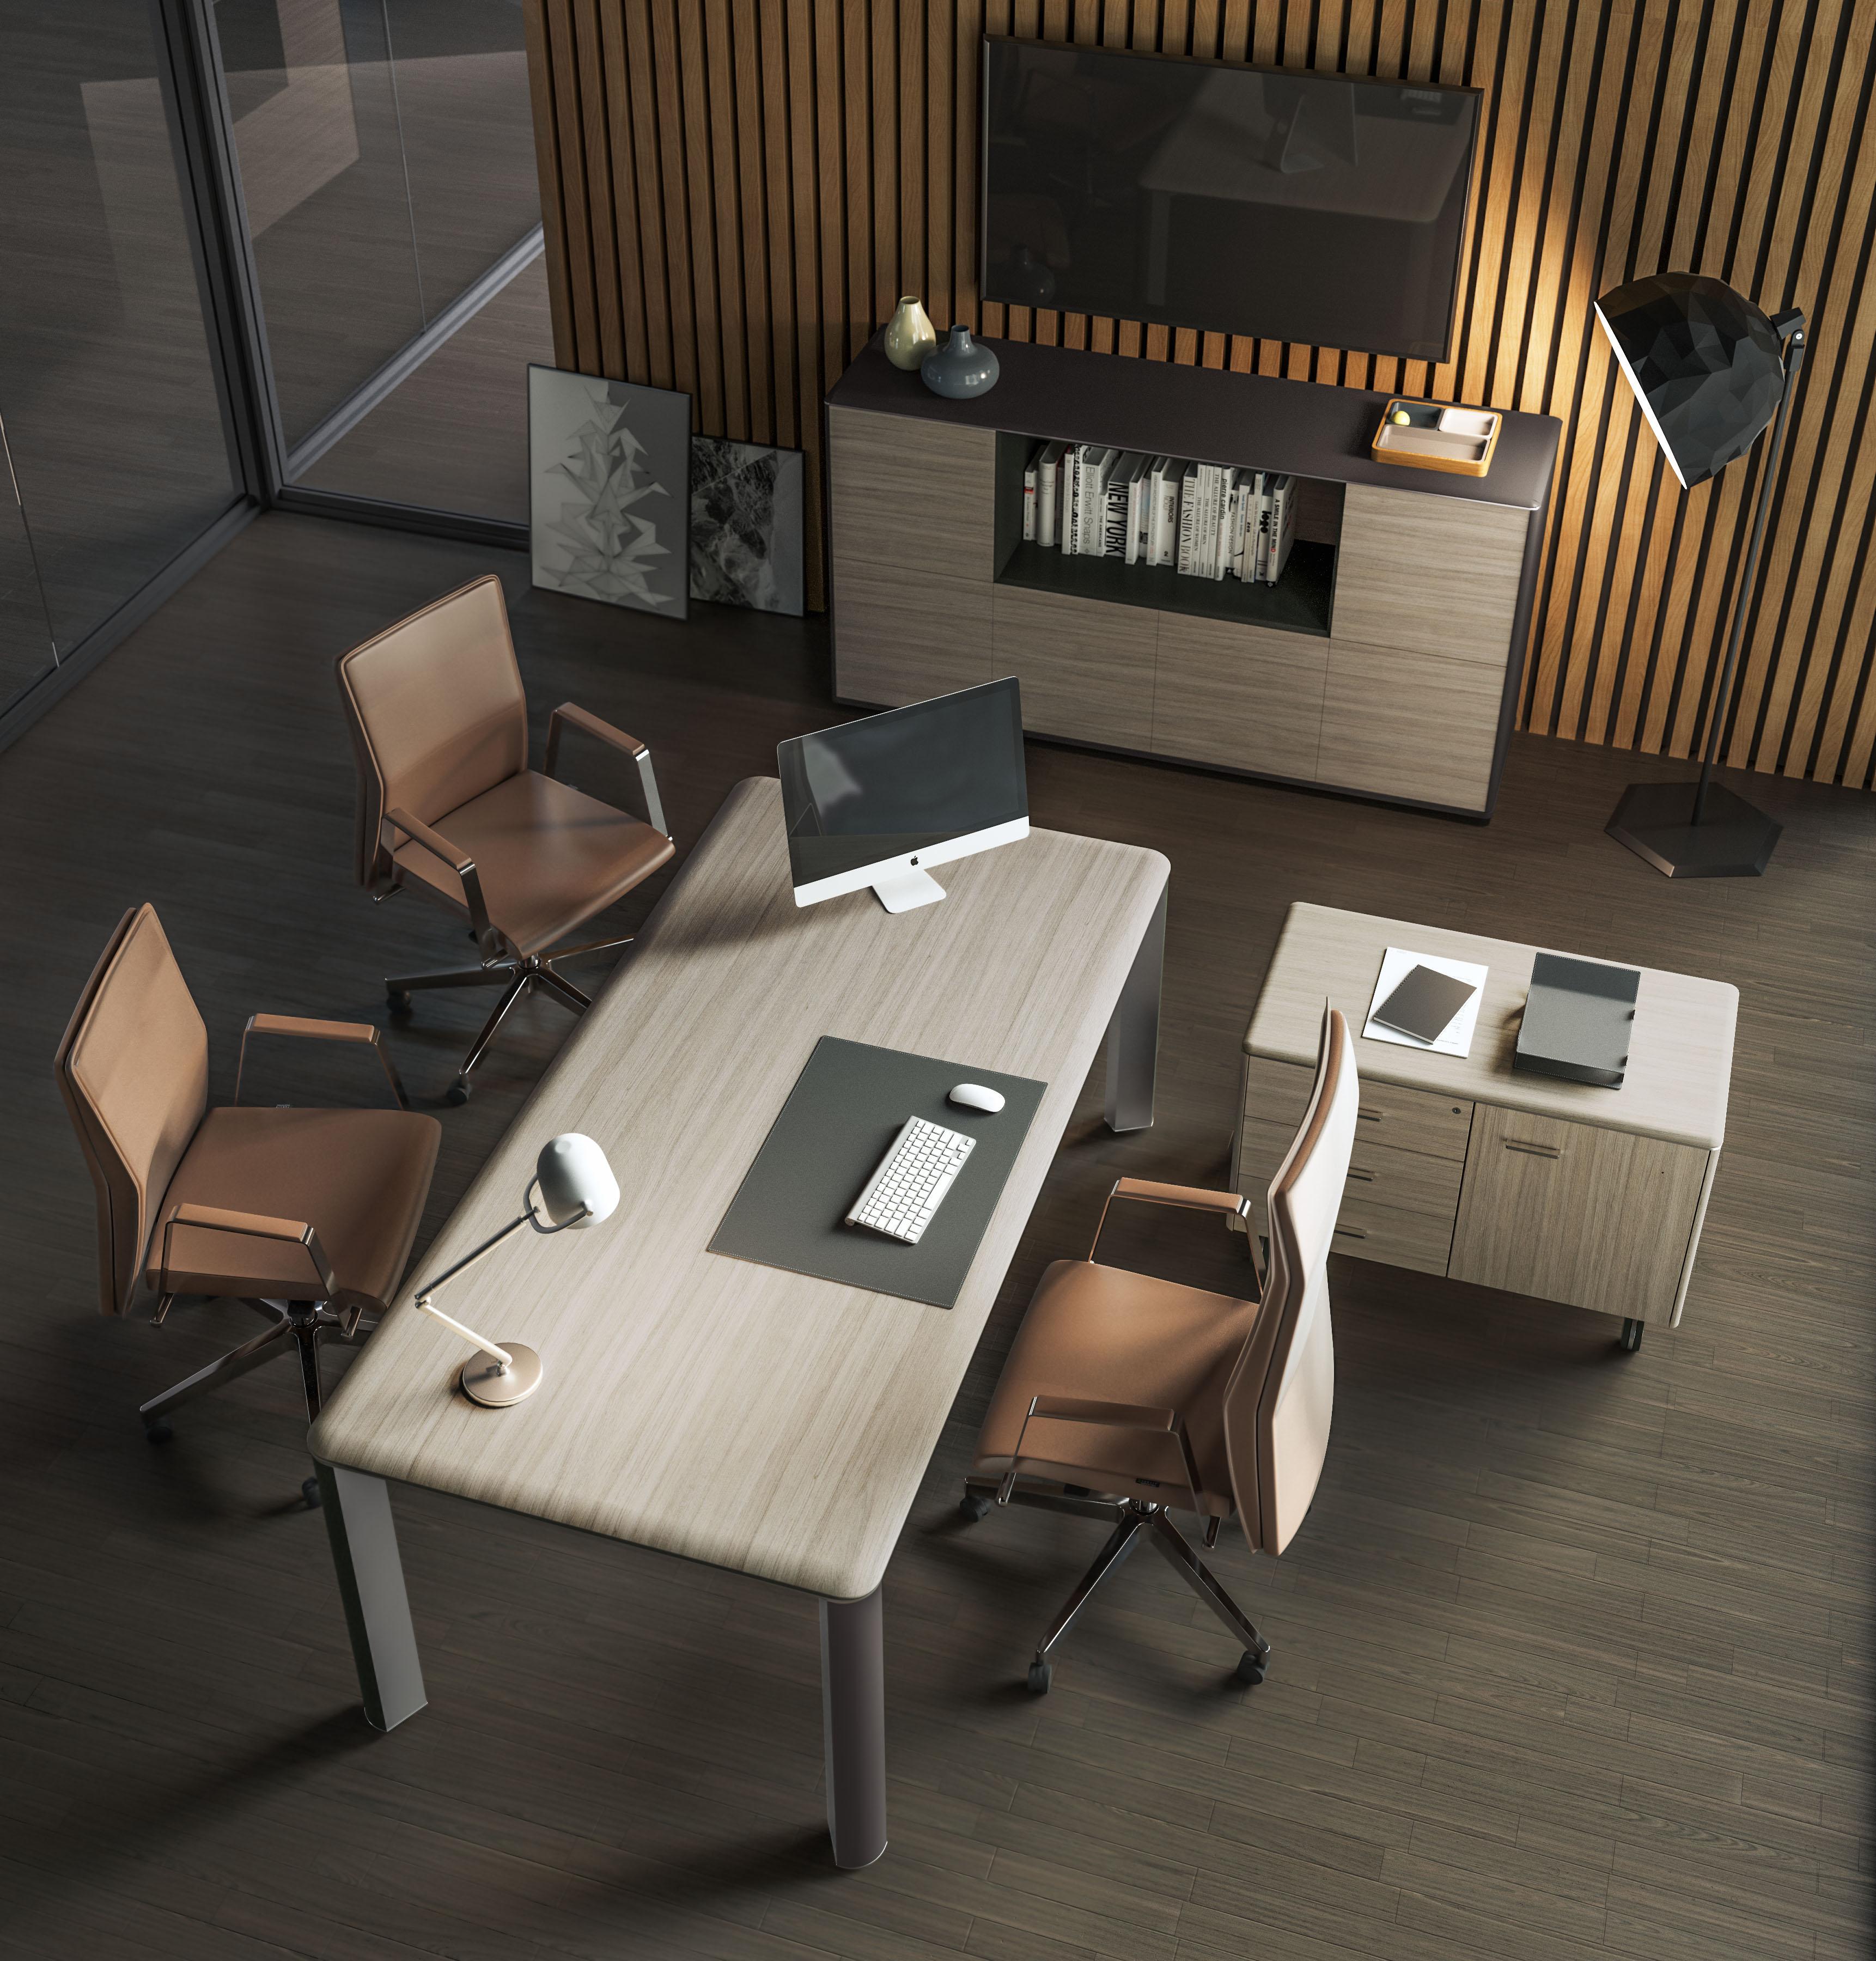 Scrivanie direzionali arredamento per uffici catania for Scrivanie direzionali per ufficio